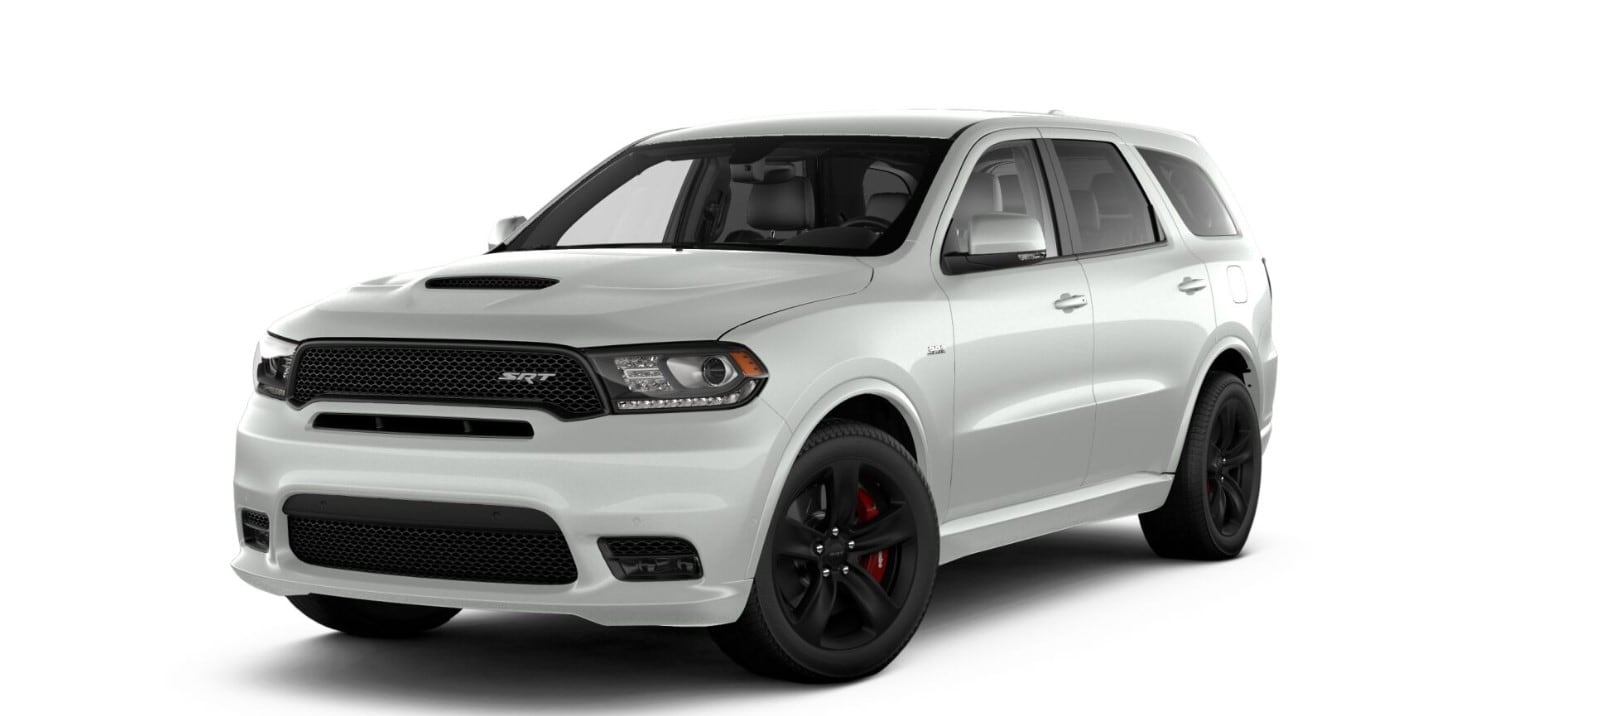 2018 Dodge Durango SRT Front White Exterior